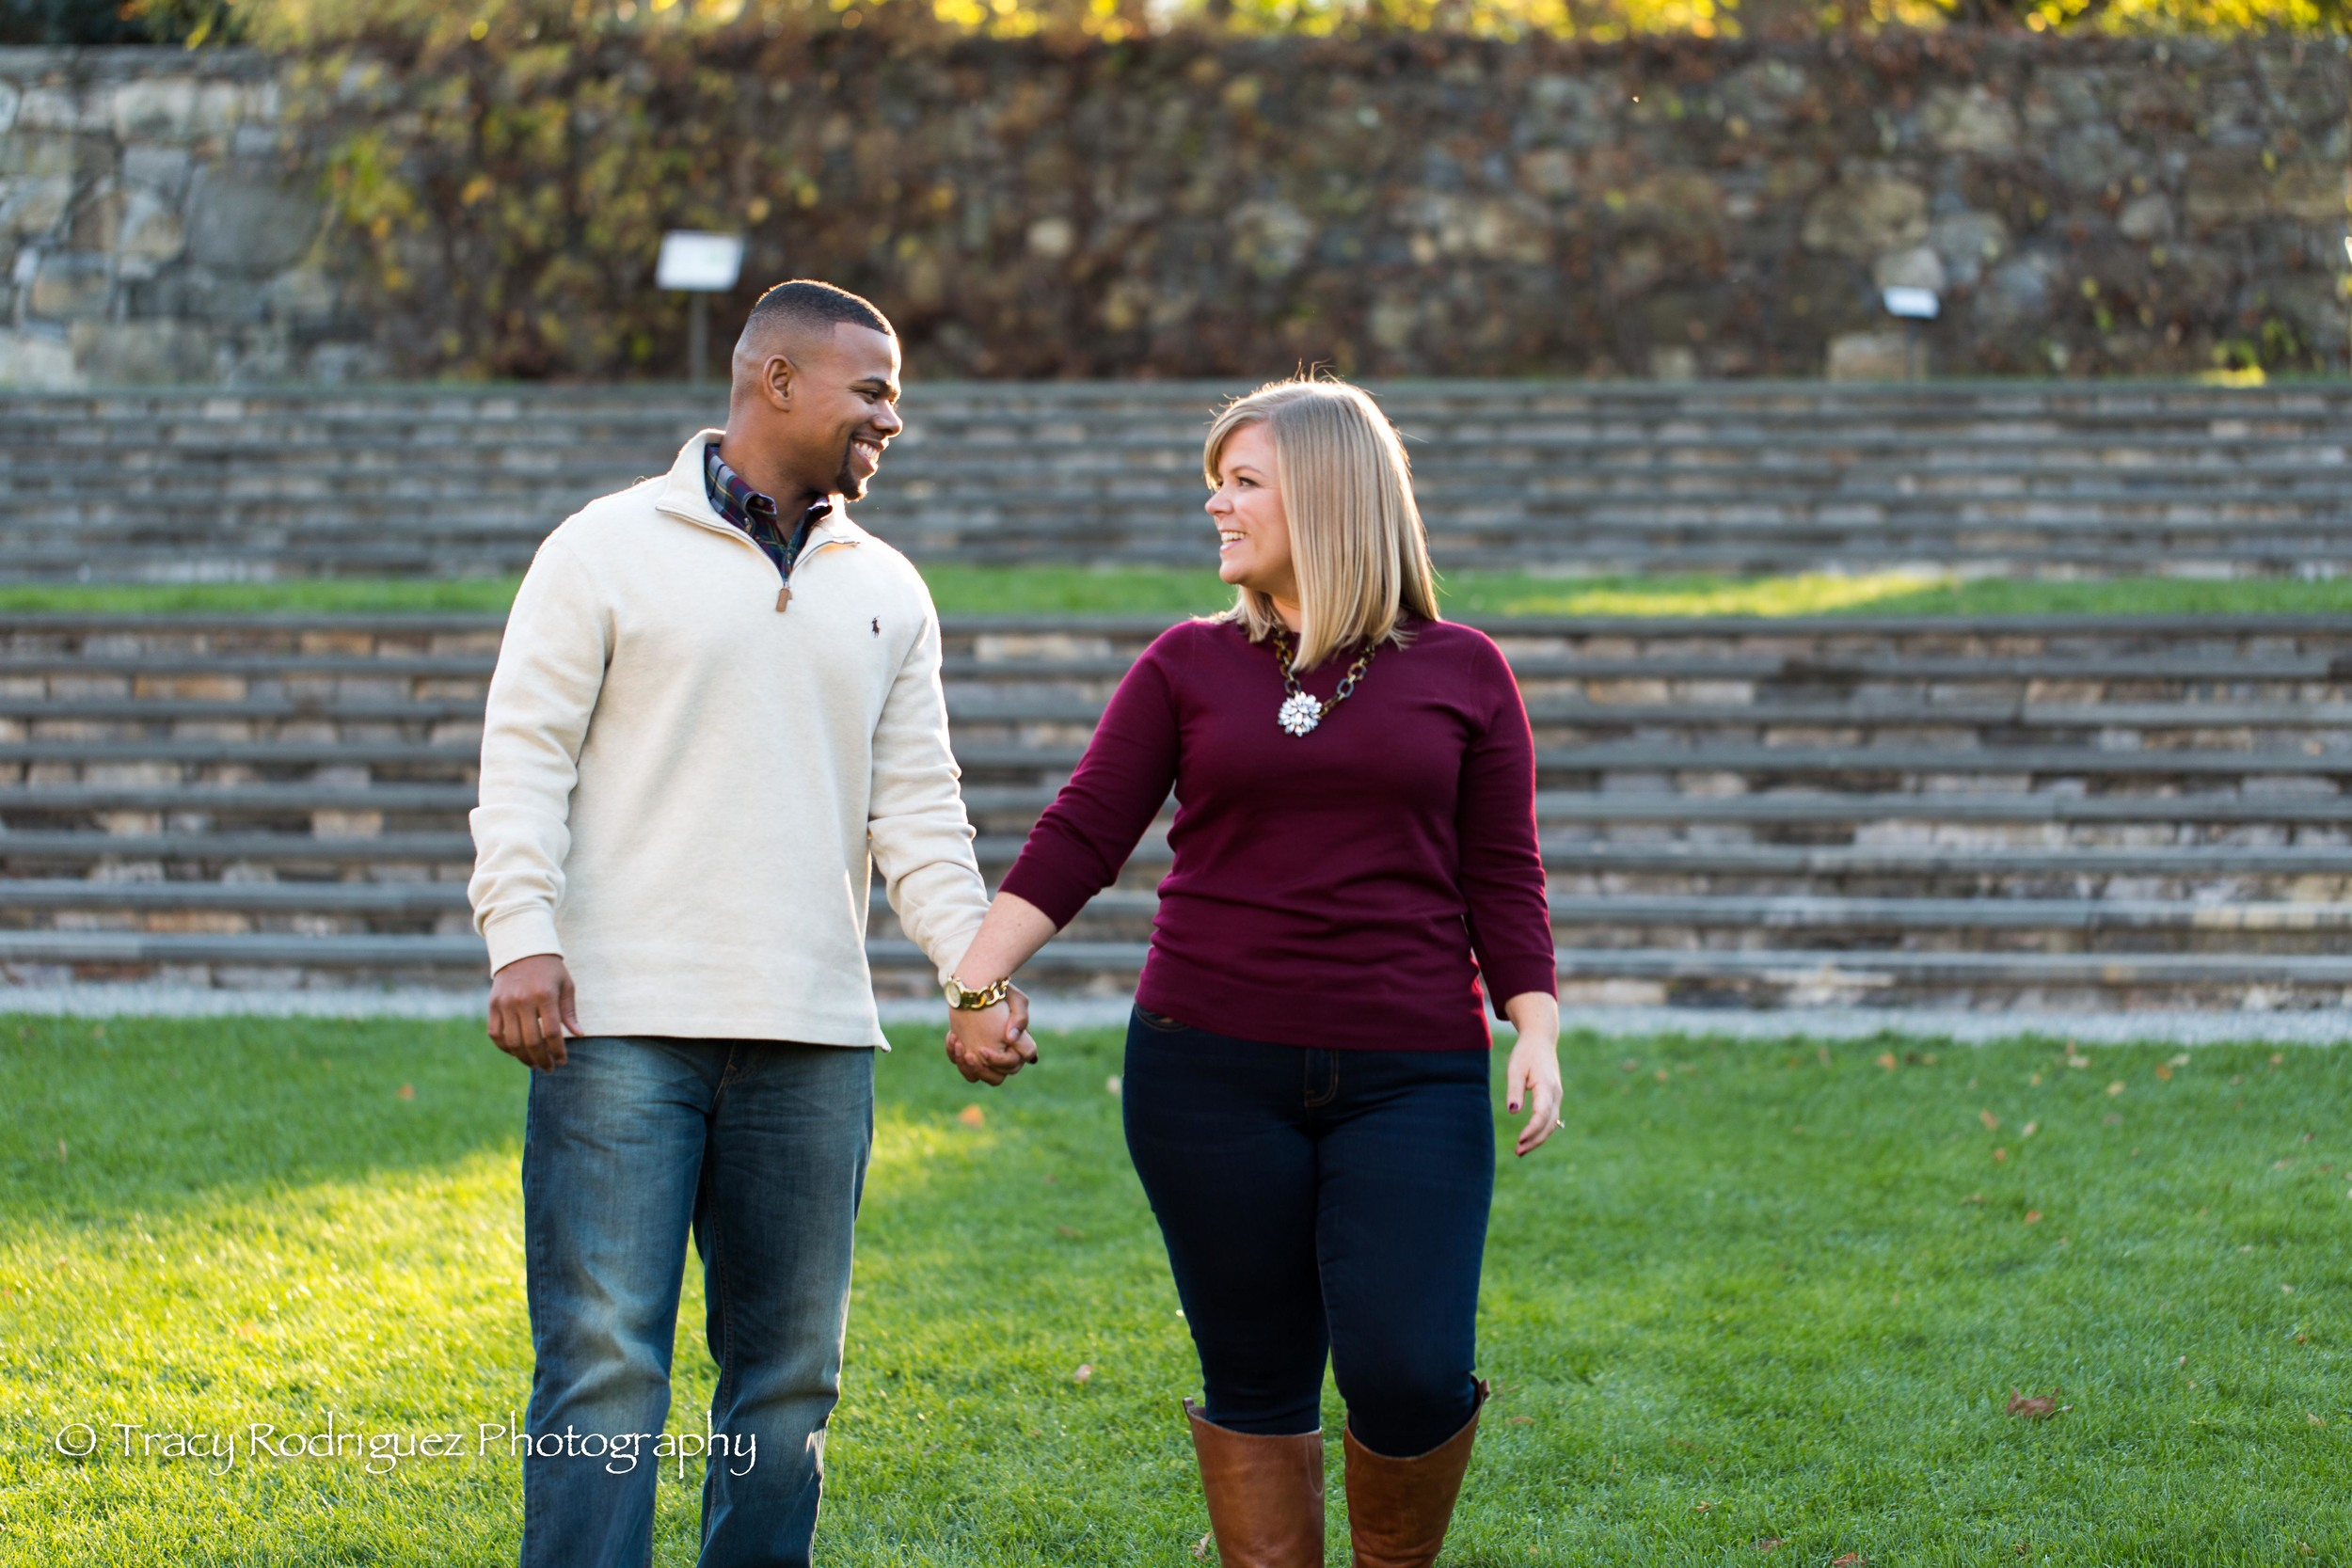 THR-Engagement-AshleyLeBron-4.jpg